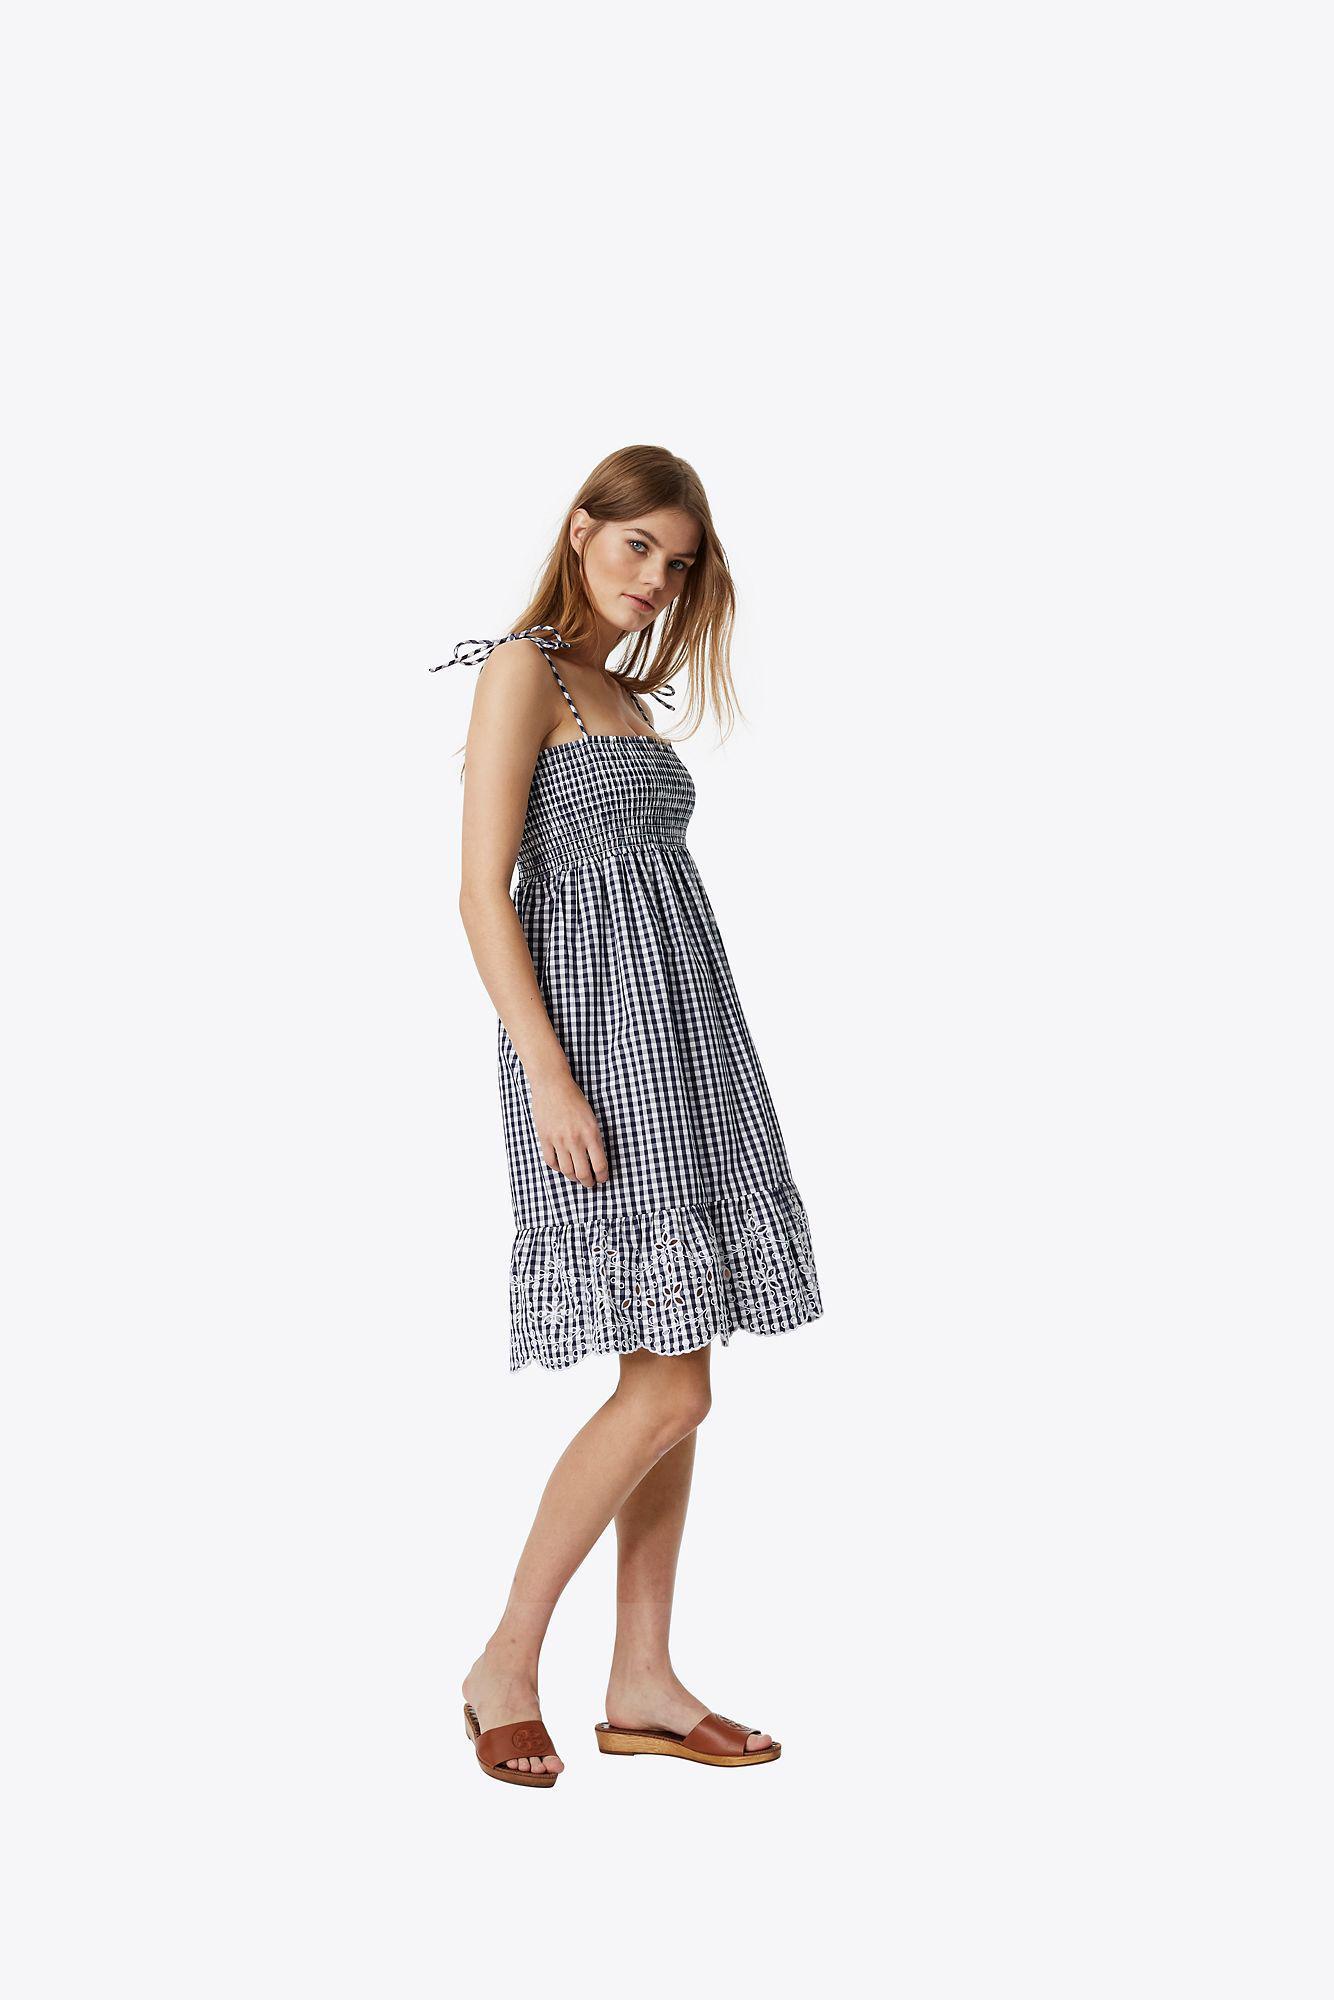 00decd8c5b578 Tory Burch Convertible Gingham Beach Dress in Blue - Lyst